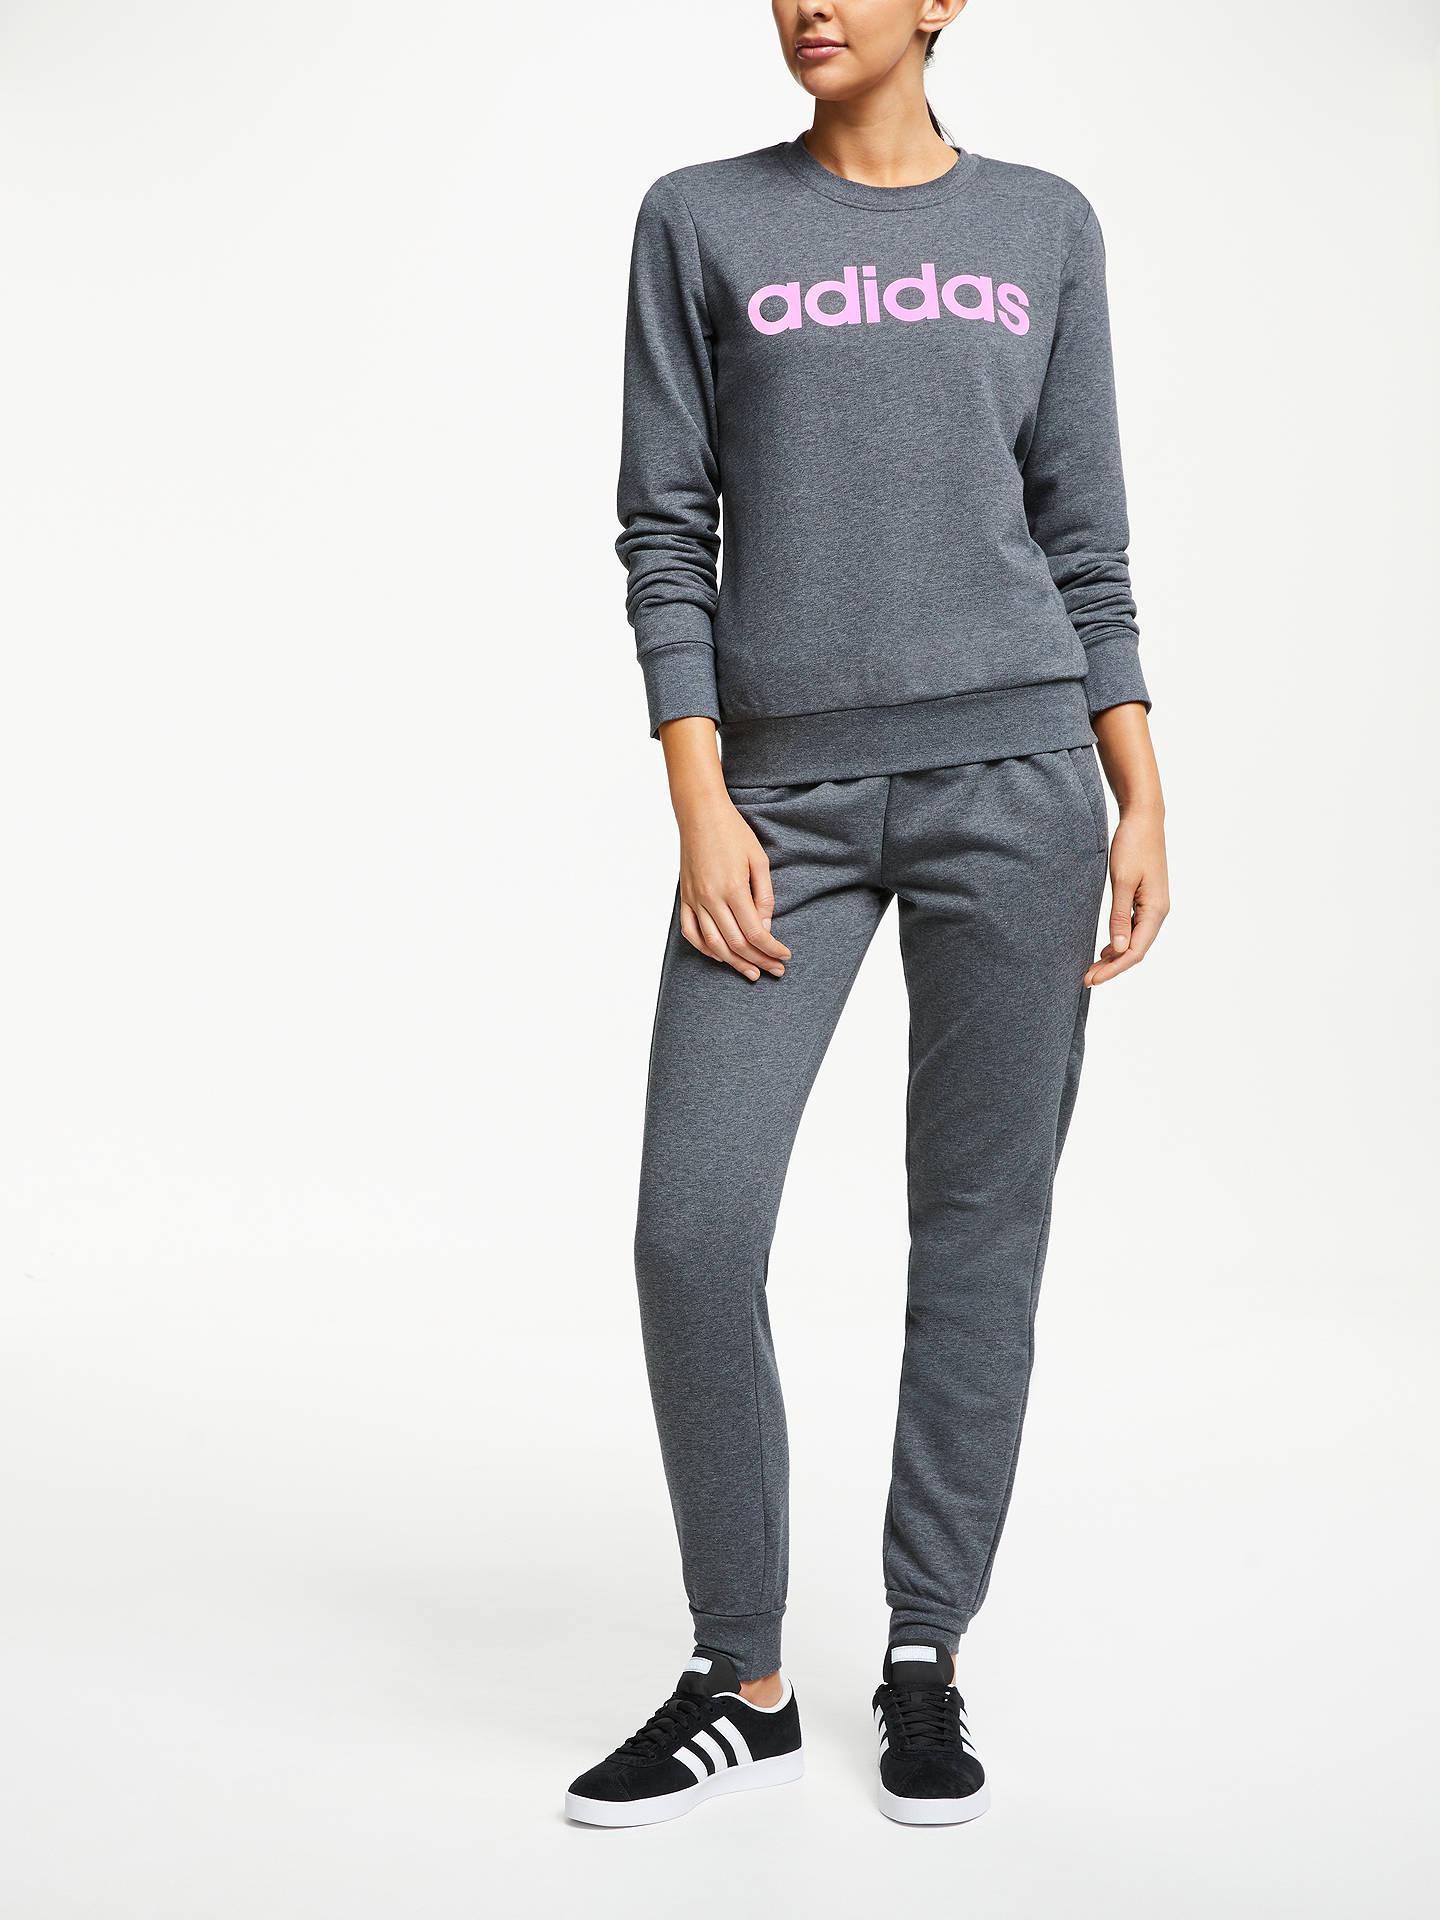 adidas Essentials Linear 34 Pants Woman dark grey heather true pink